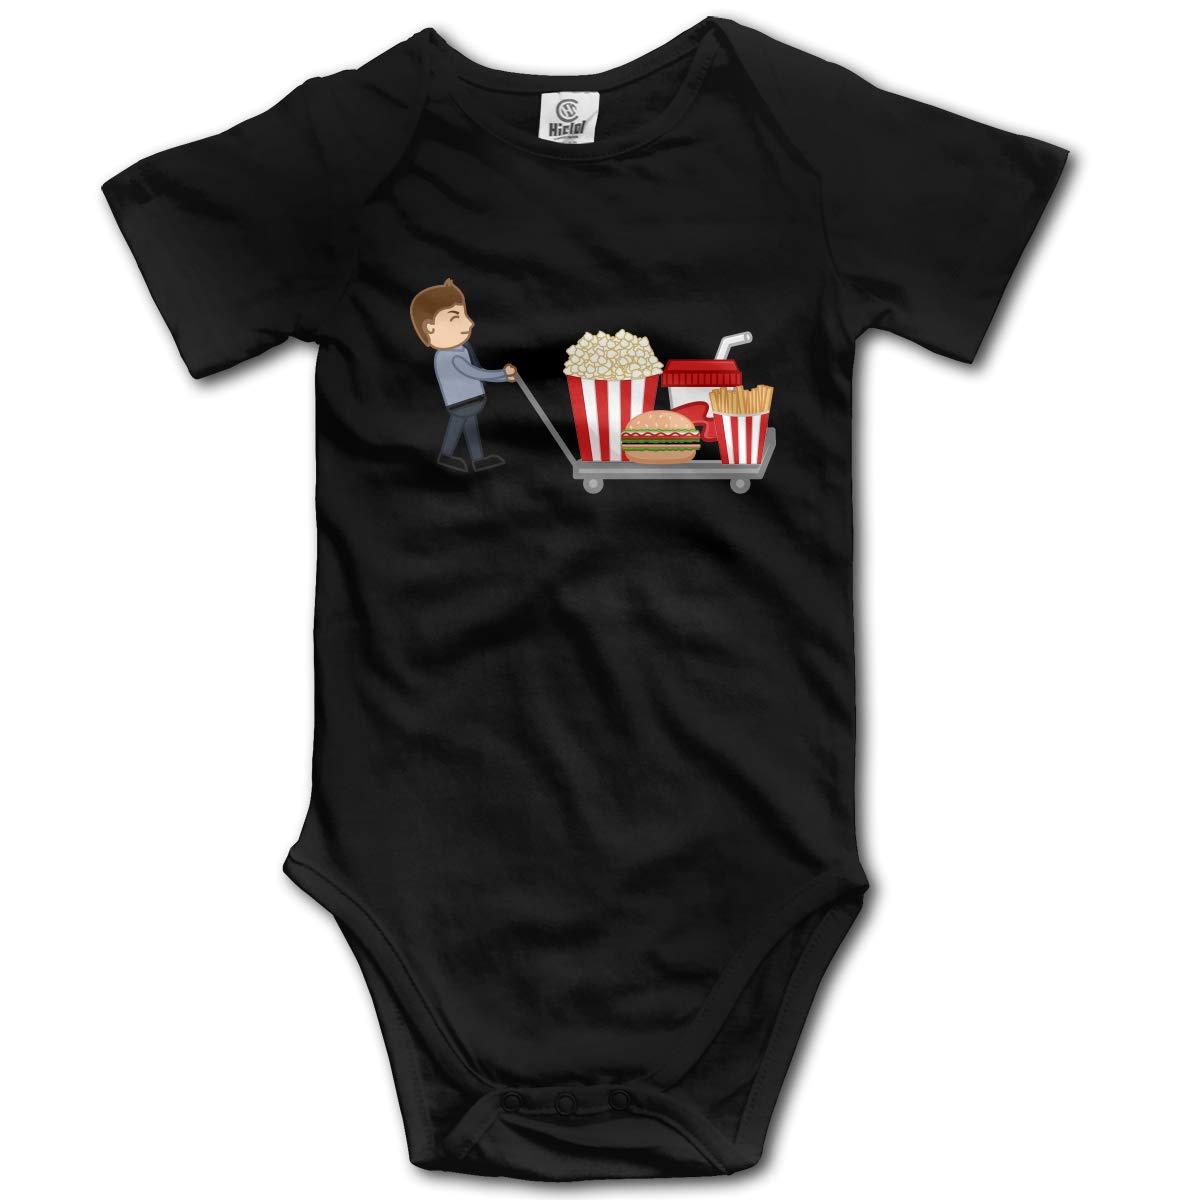 XHX Newborn Baby Hamburgers French Fries Cola Popcorn Short Sleeve Romper Onesie Bodysuit Jumpsuit